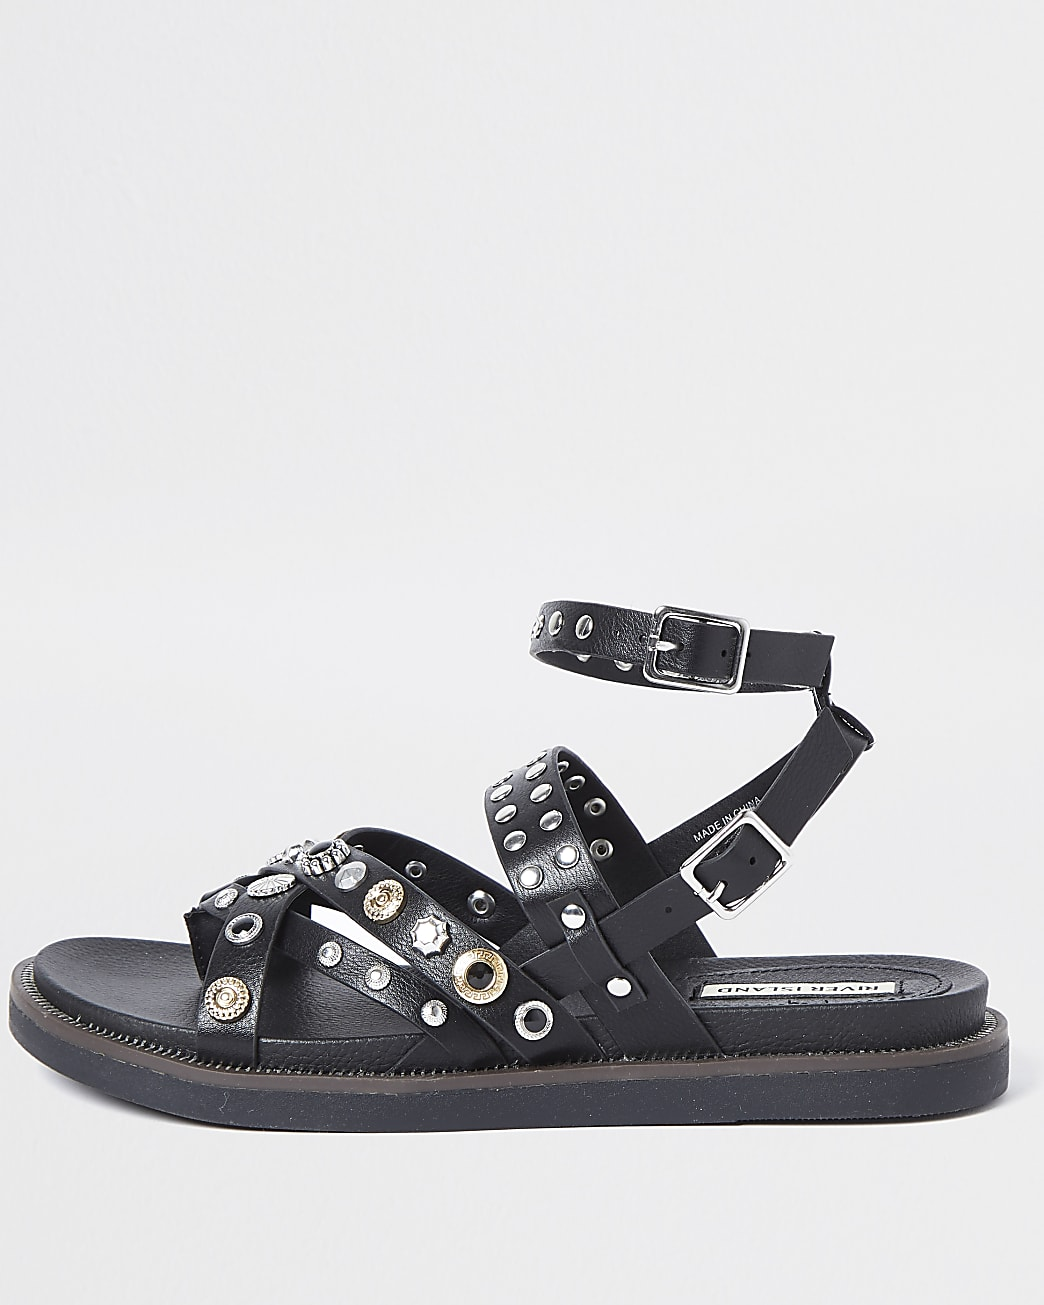 Black studded flat sandals